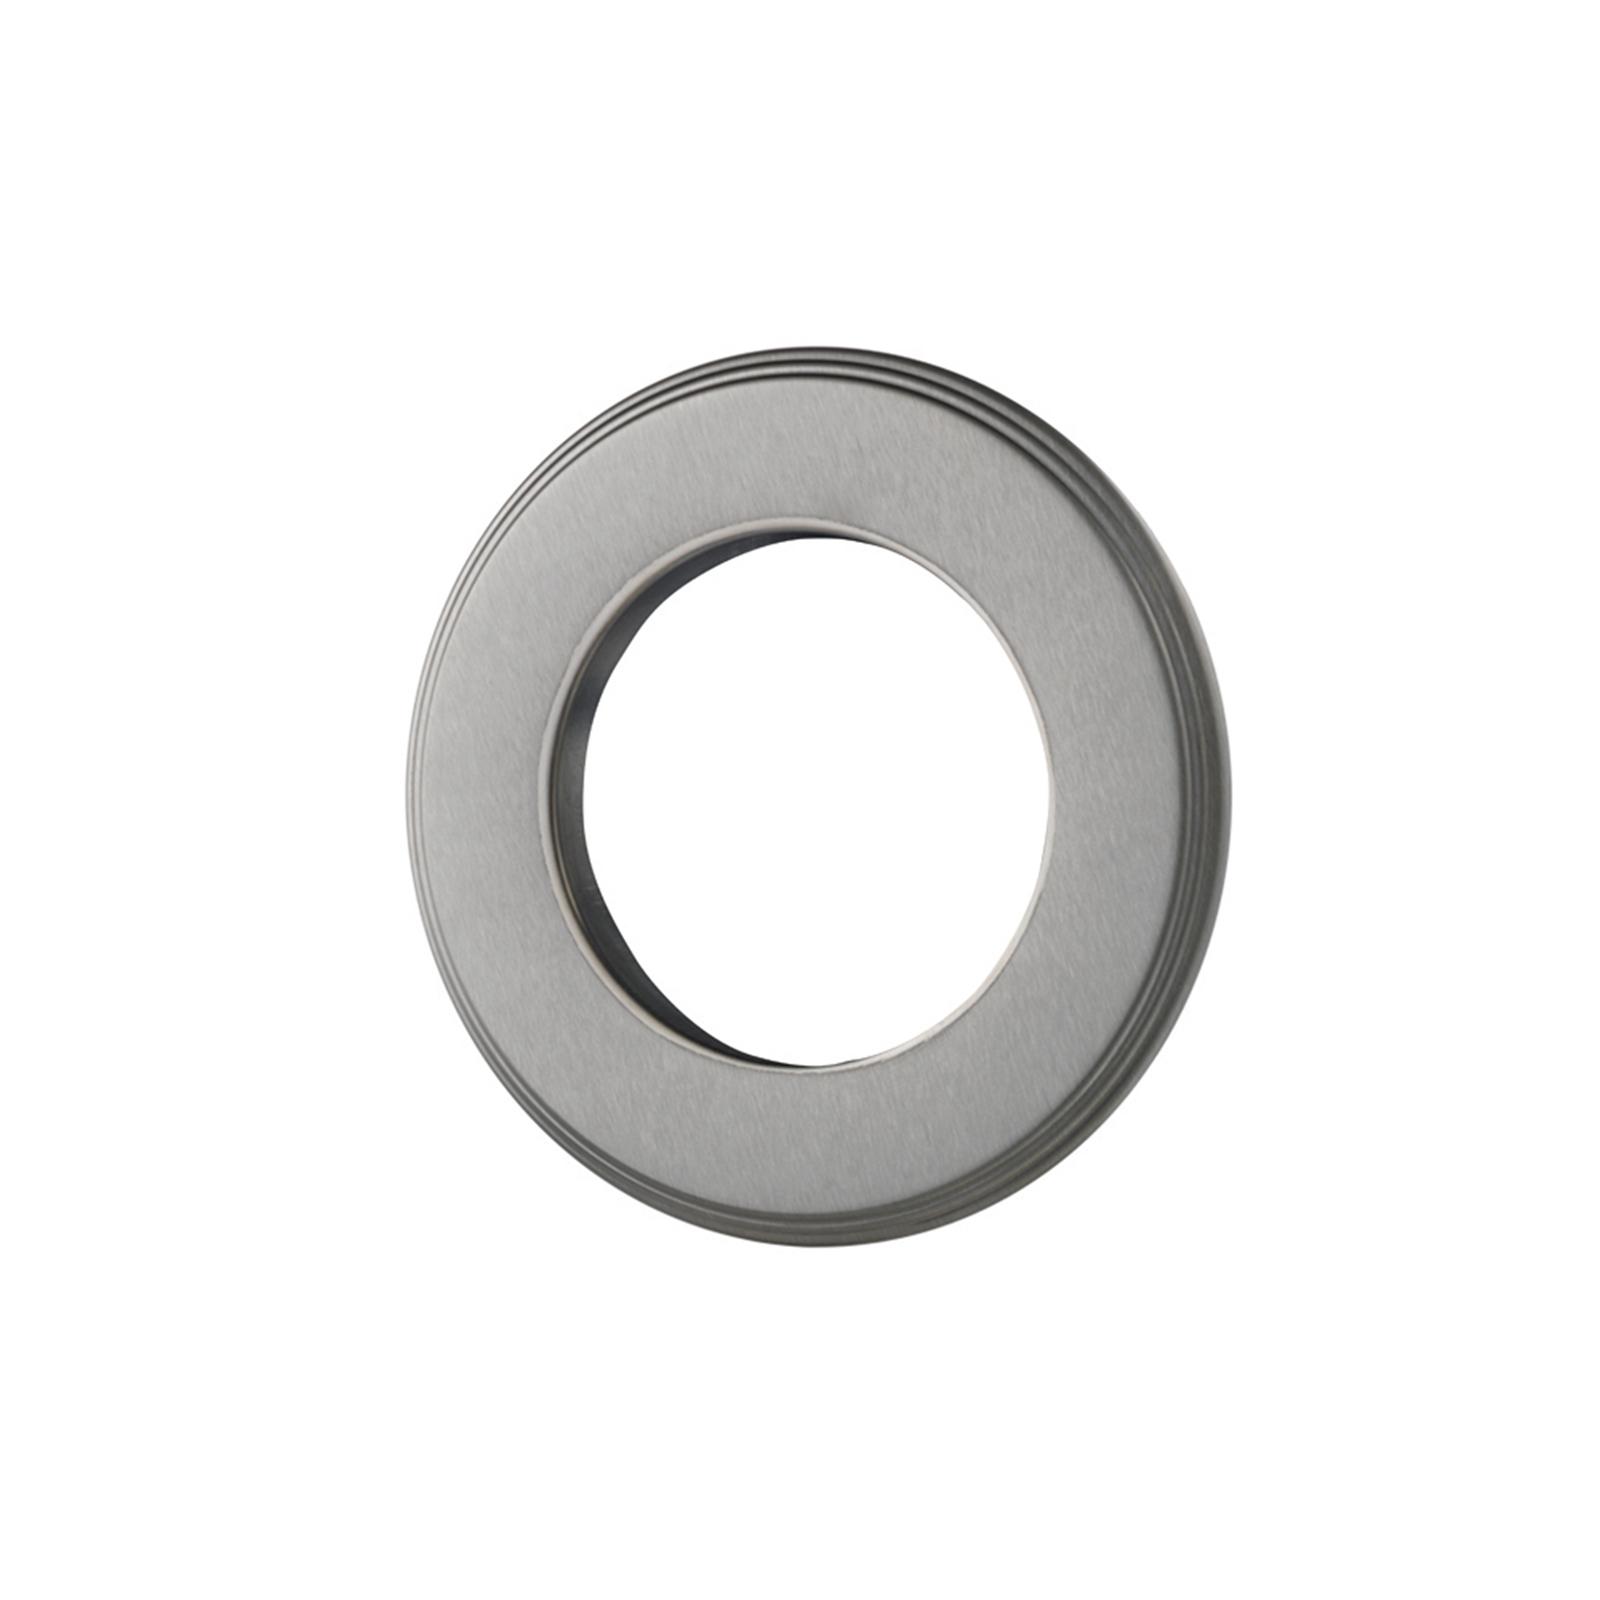 Sandleford 170mm Stainless Steel Newspaper Ring